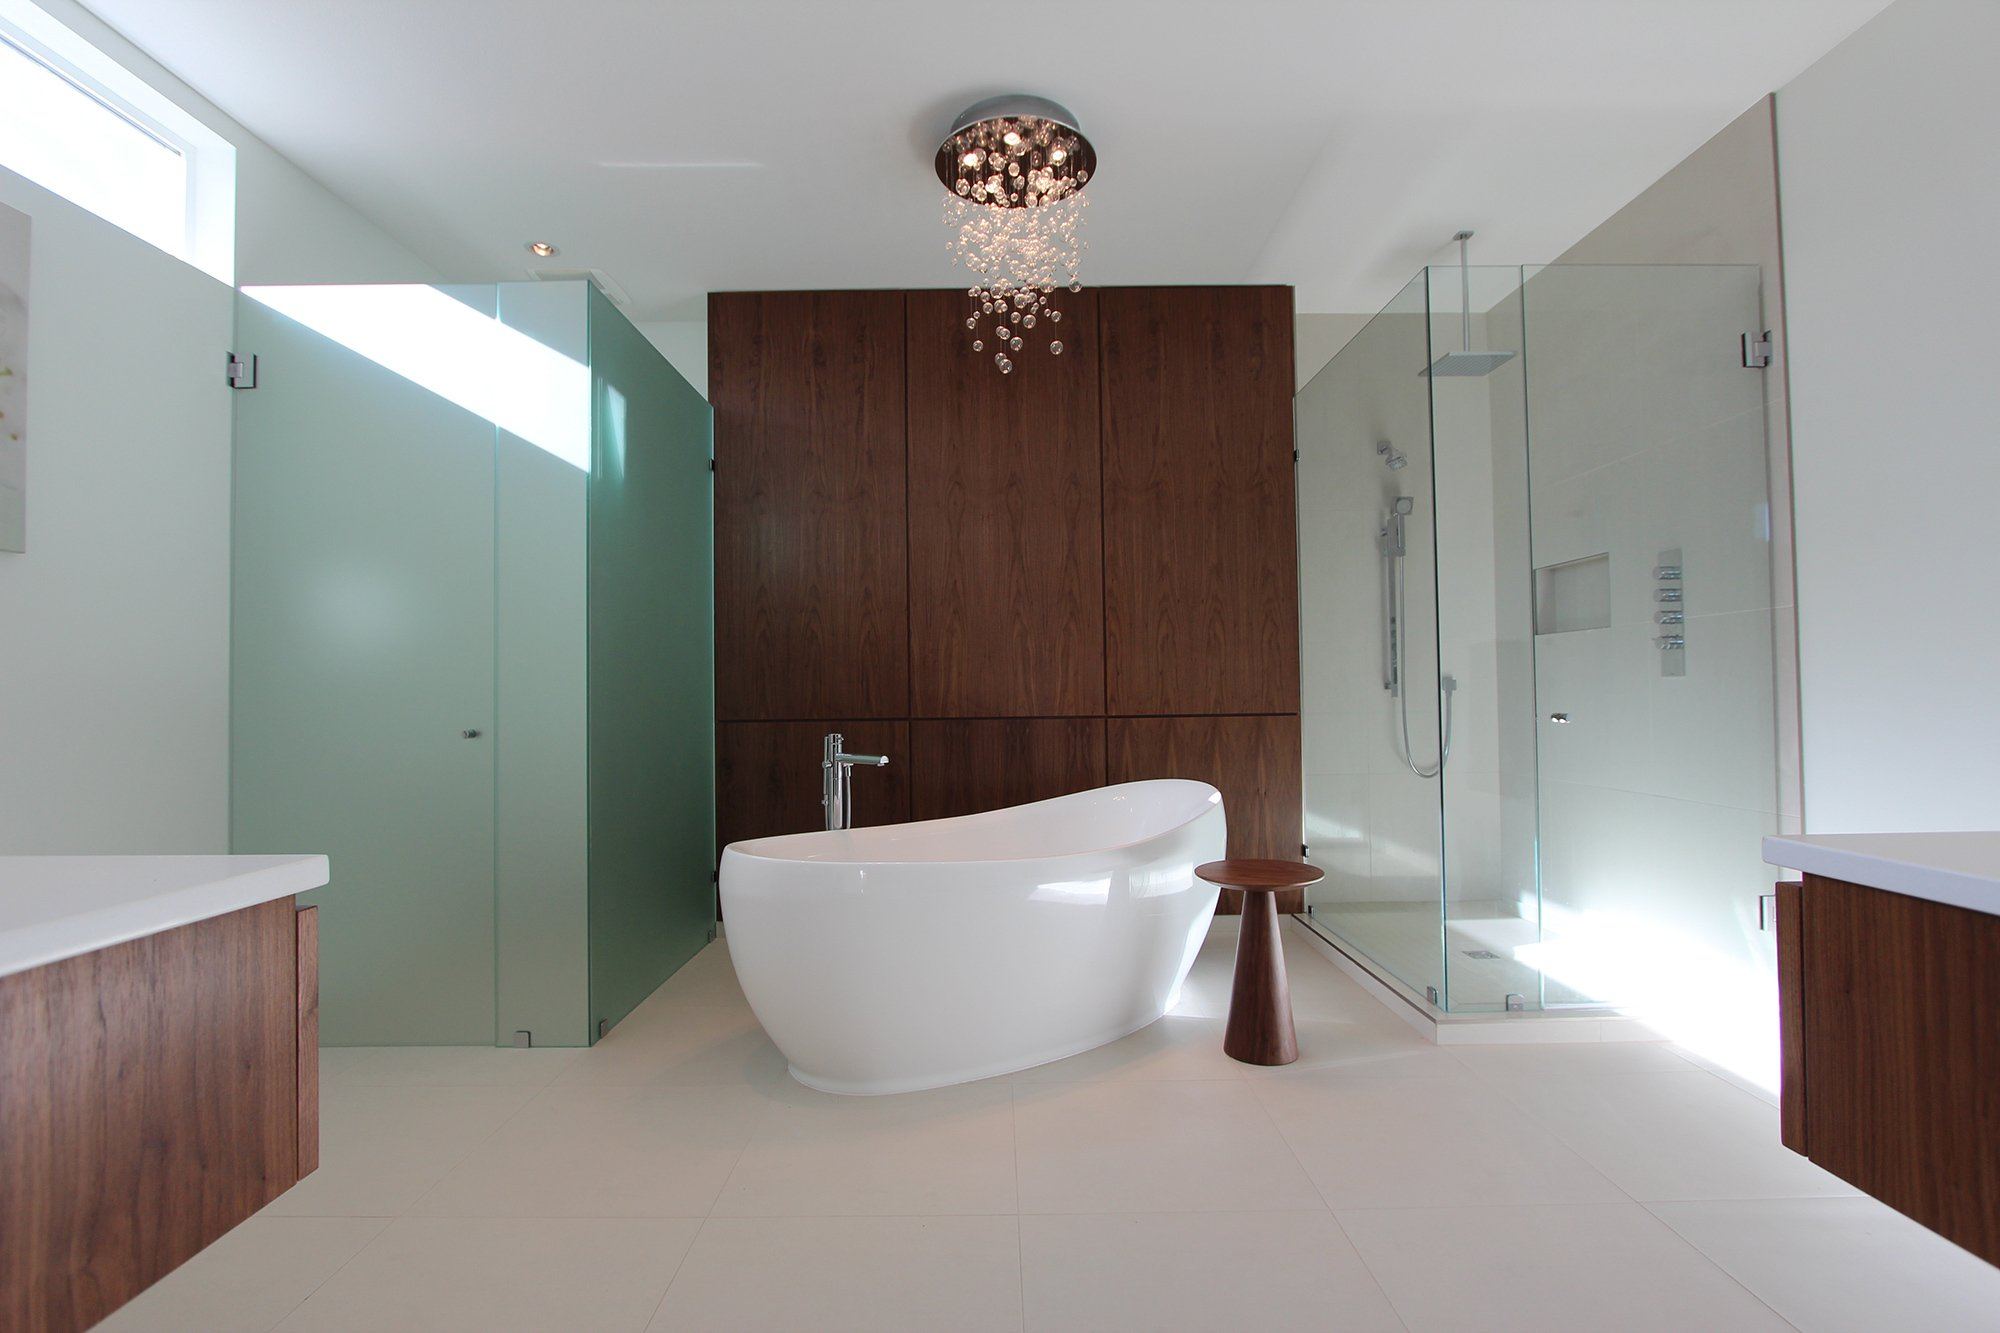 Interior of home bathroom